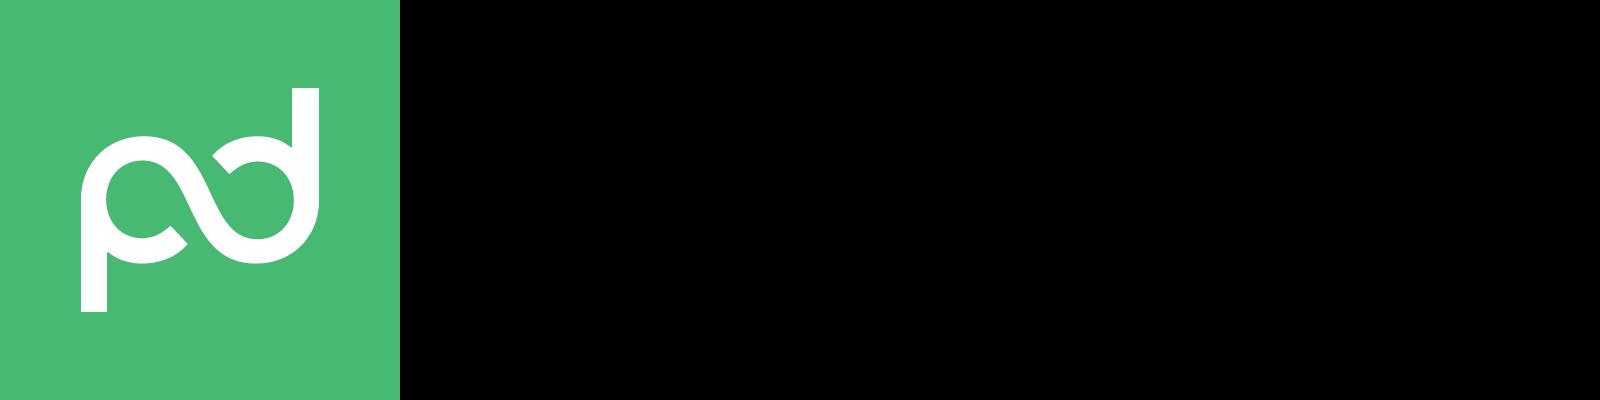 File:PandaDoc Logo PNG.png - Wikimedia Commons